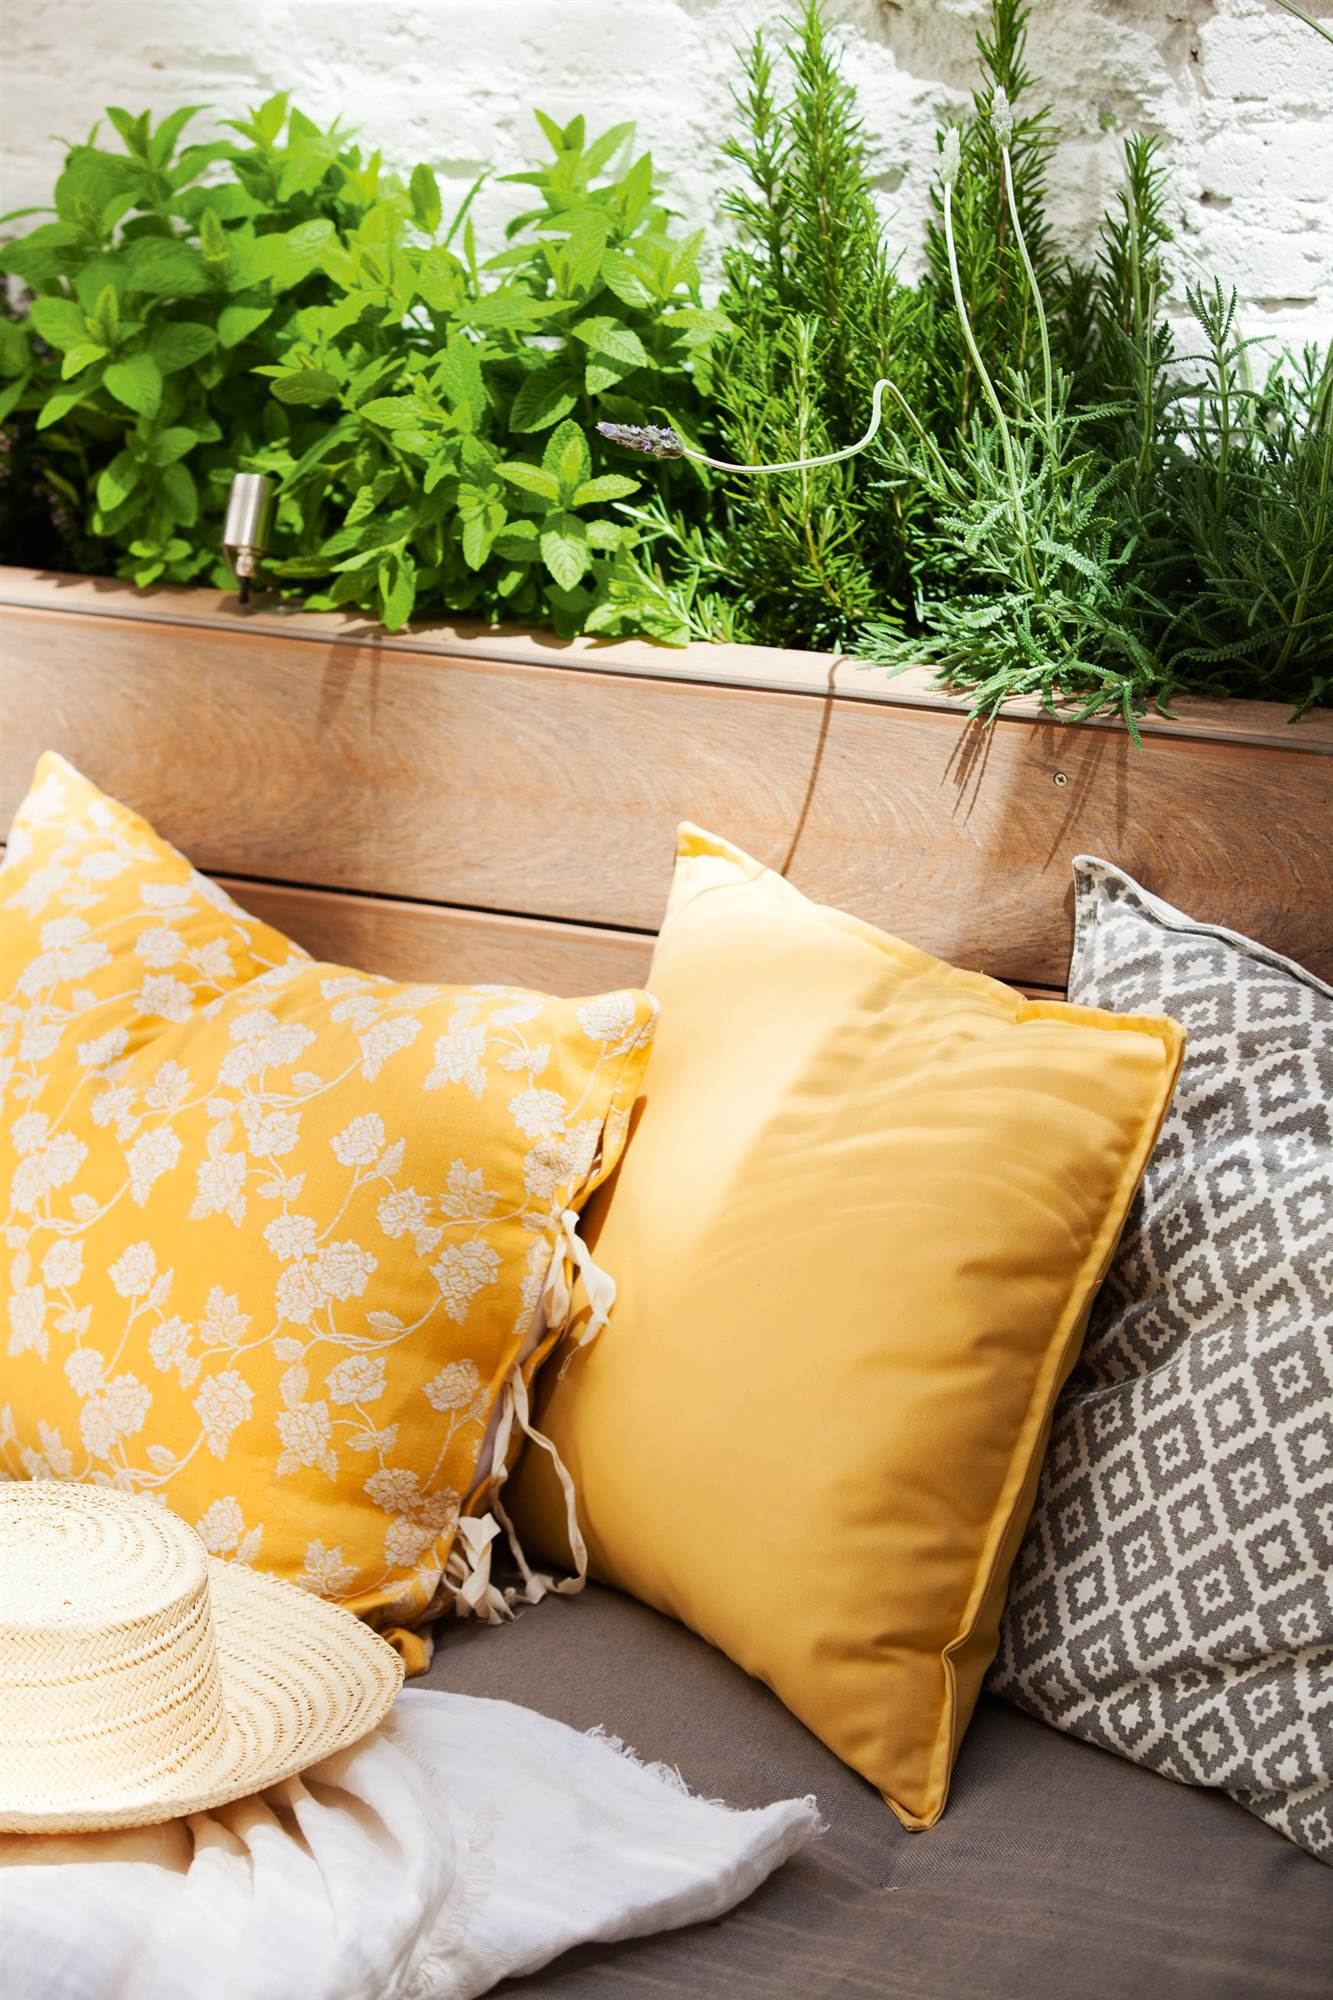 Tendencias de verano en textiles de exterior - Cojines para exterior ...